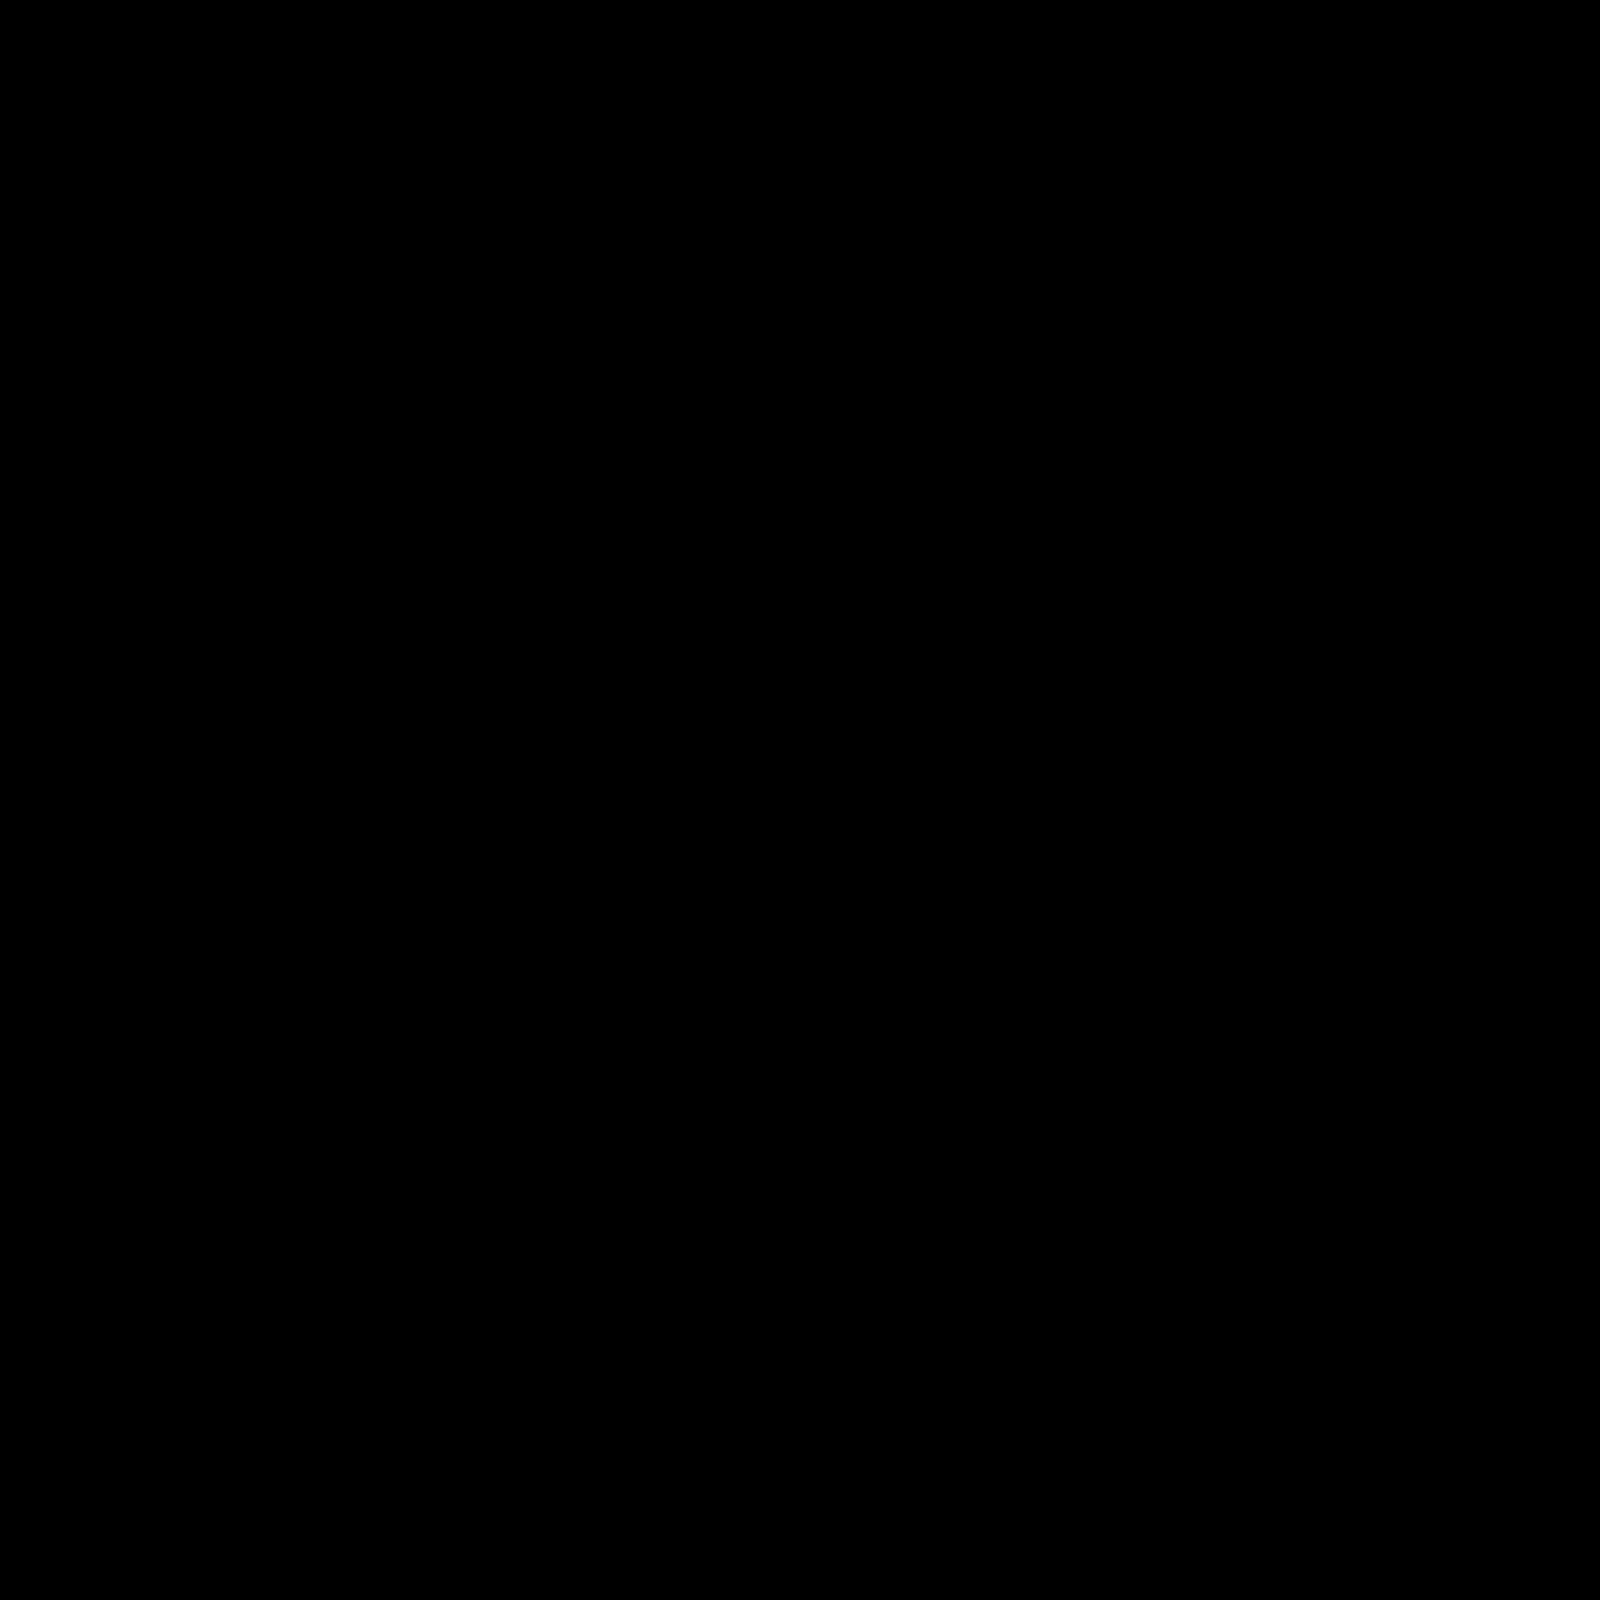 Стрелец знак зодиака PNG